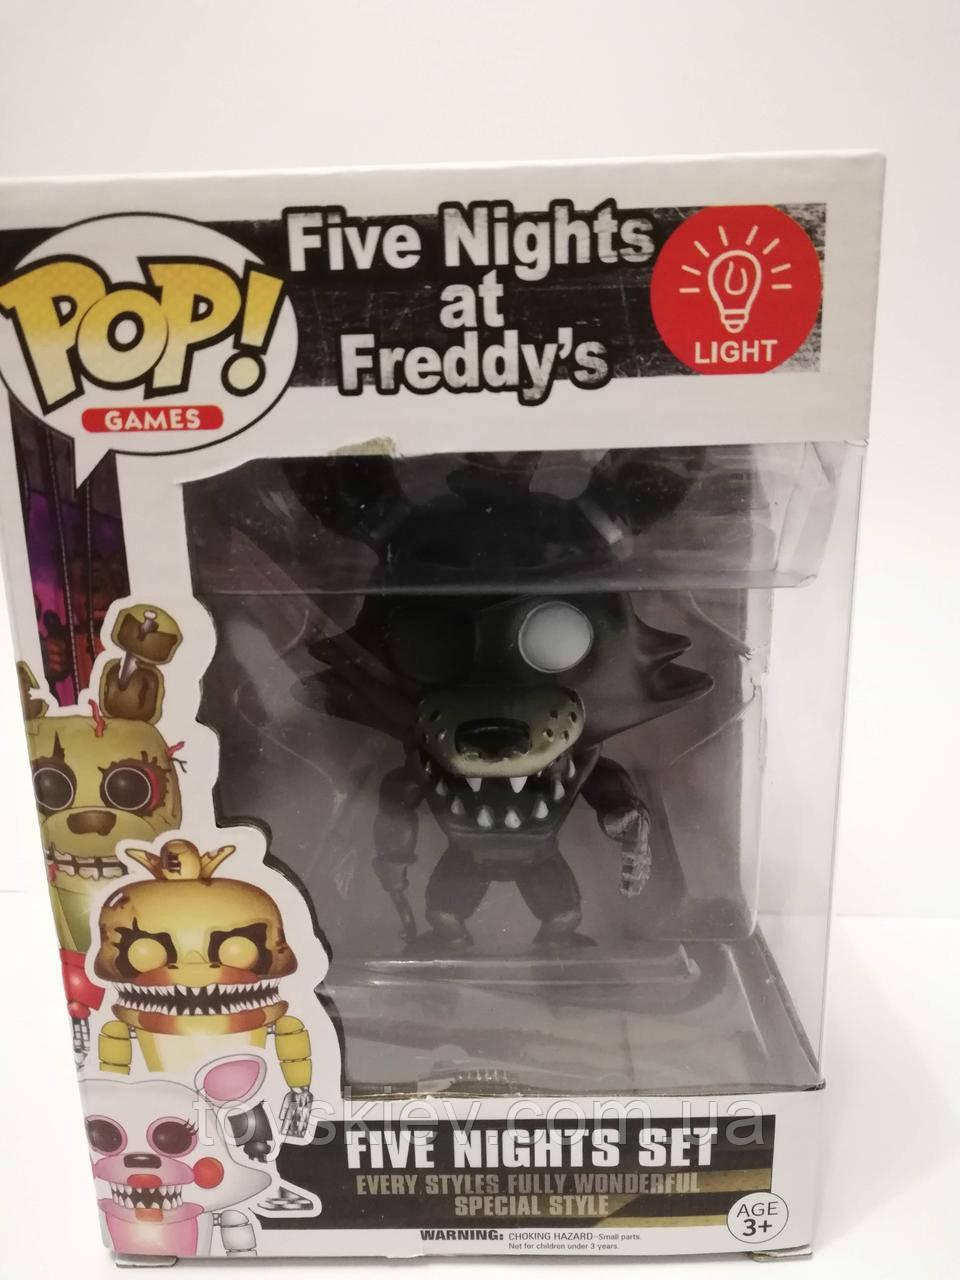 Игрушки 5 пять ночей с Фредди, Фредди / Funko Five Nights at Freddy's, Freddy 2011-4 свет эффекты.